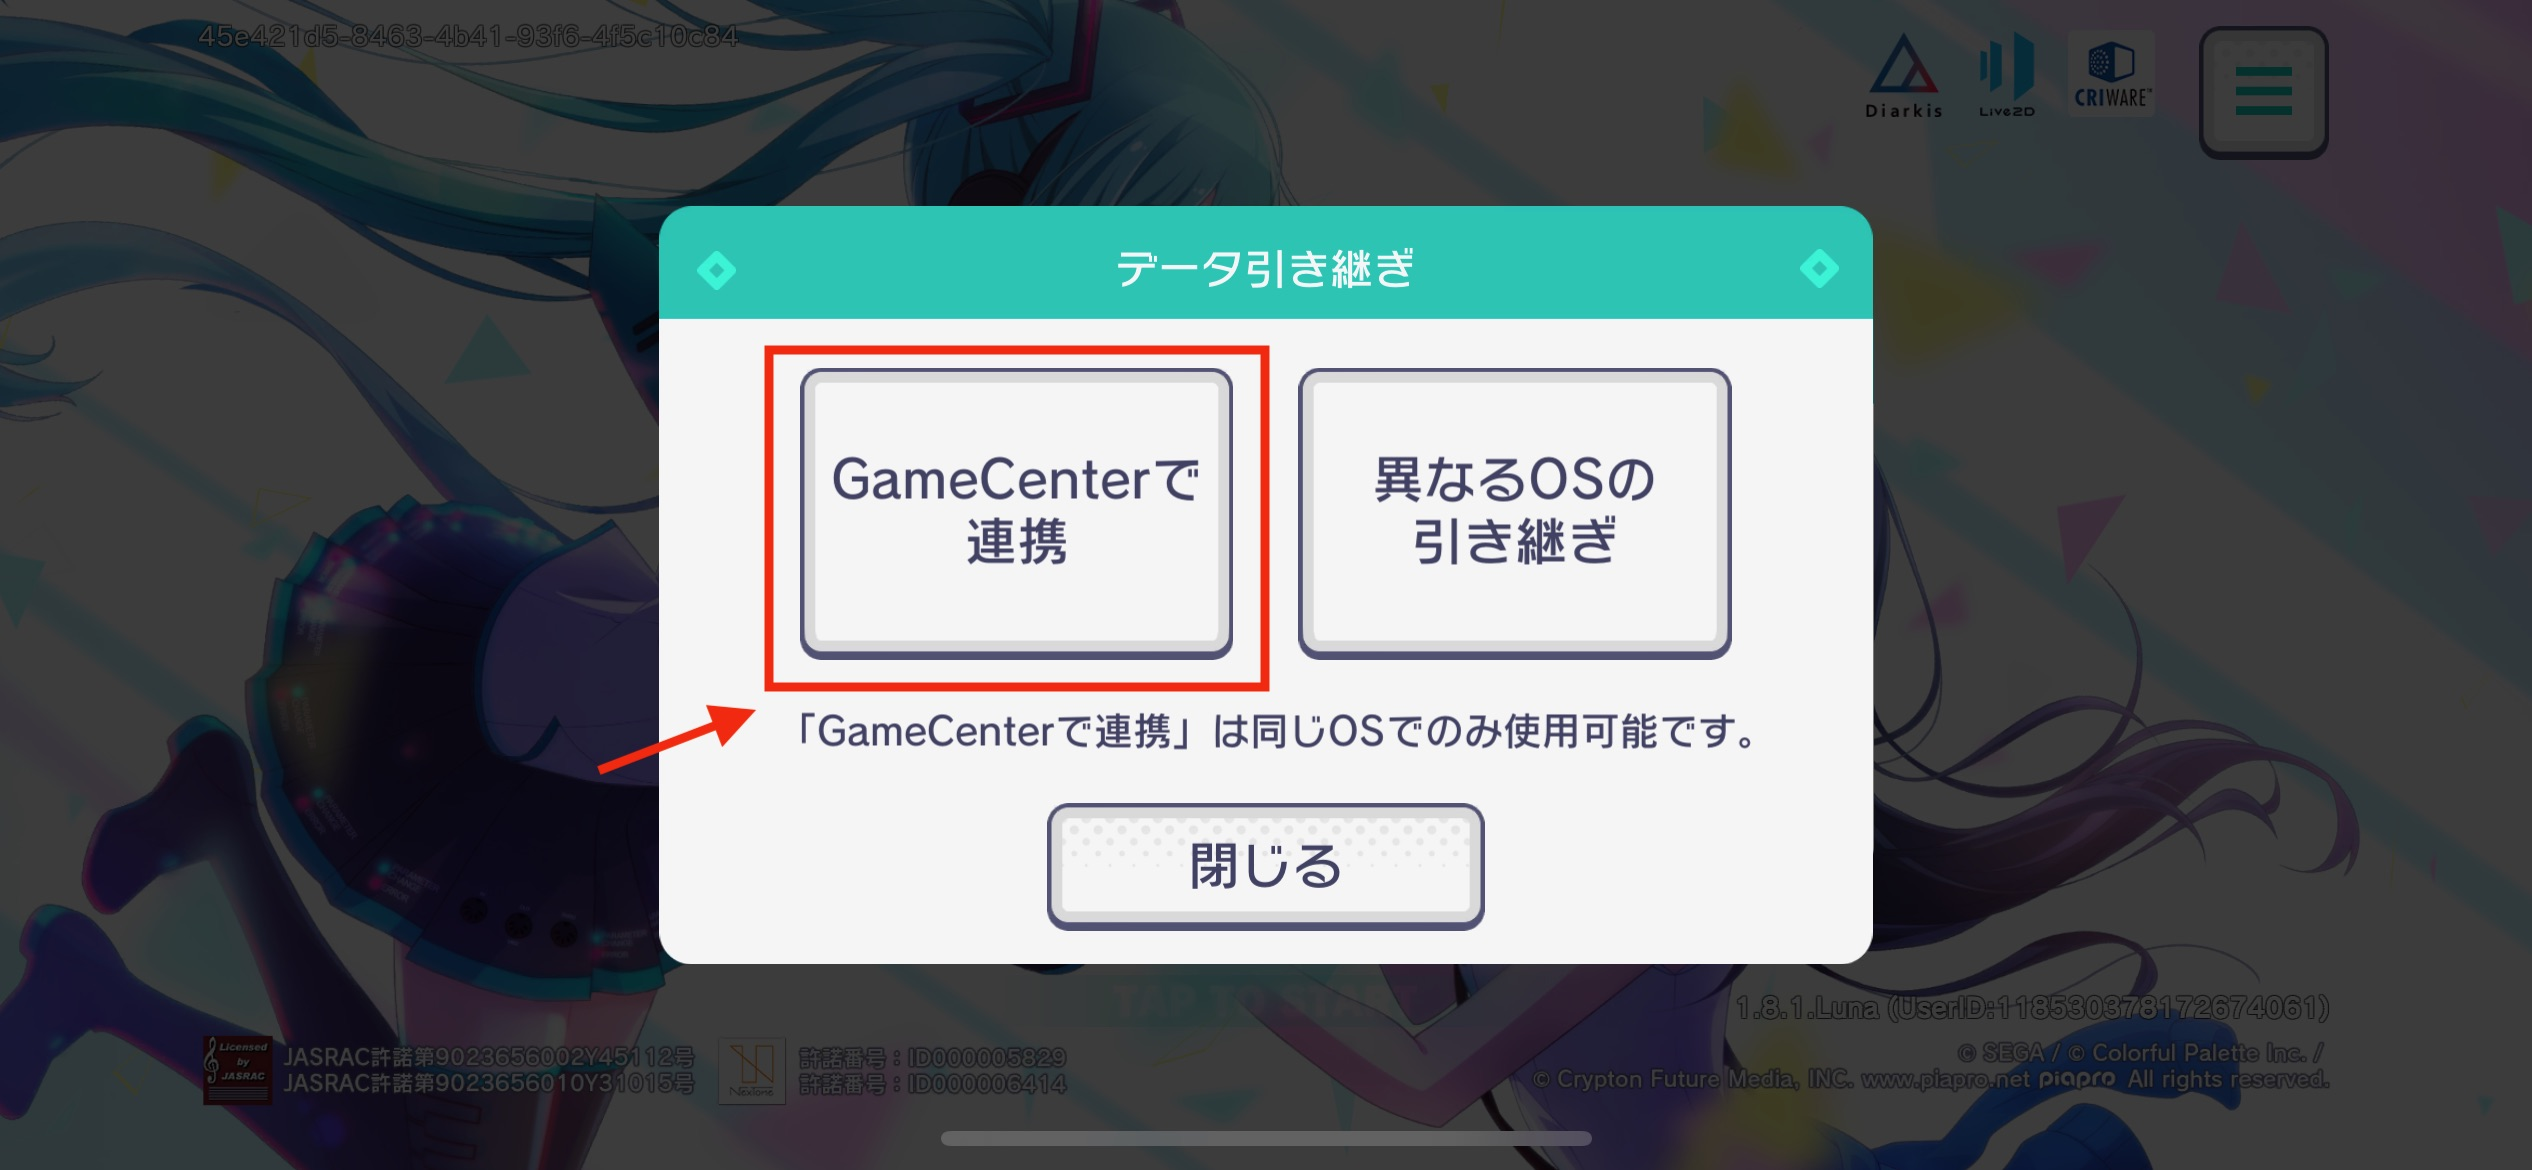 「Game Centerで連携」を選択する